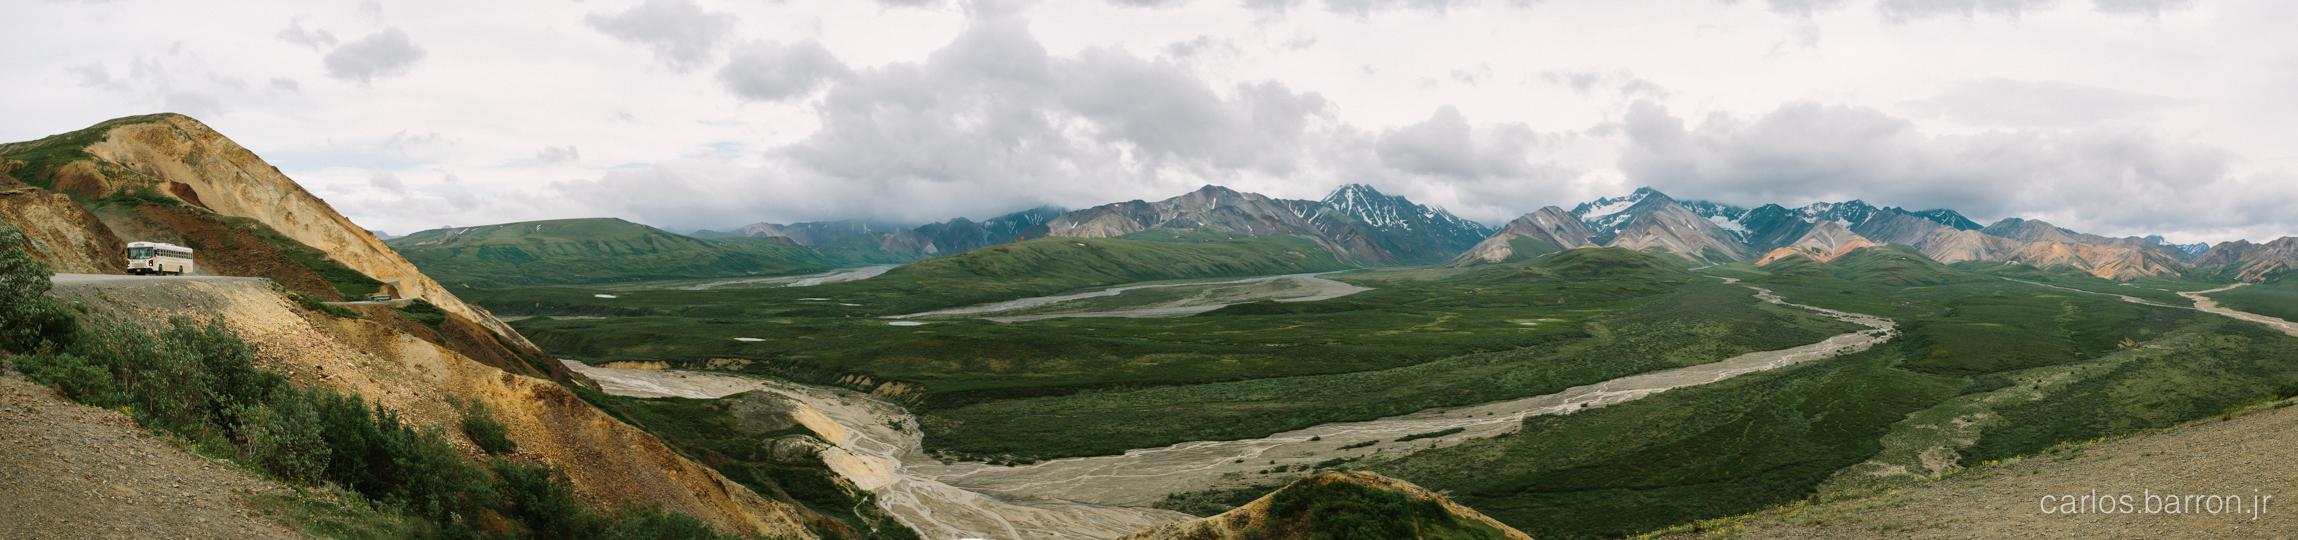 #Denali National Park, #Alaska  // © Carlos Barron Jr